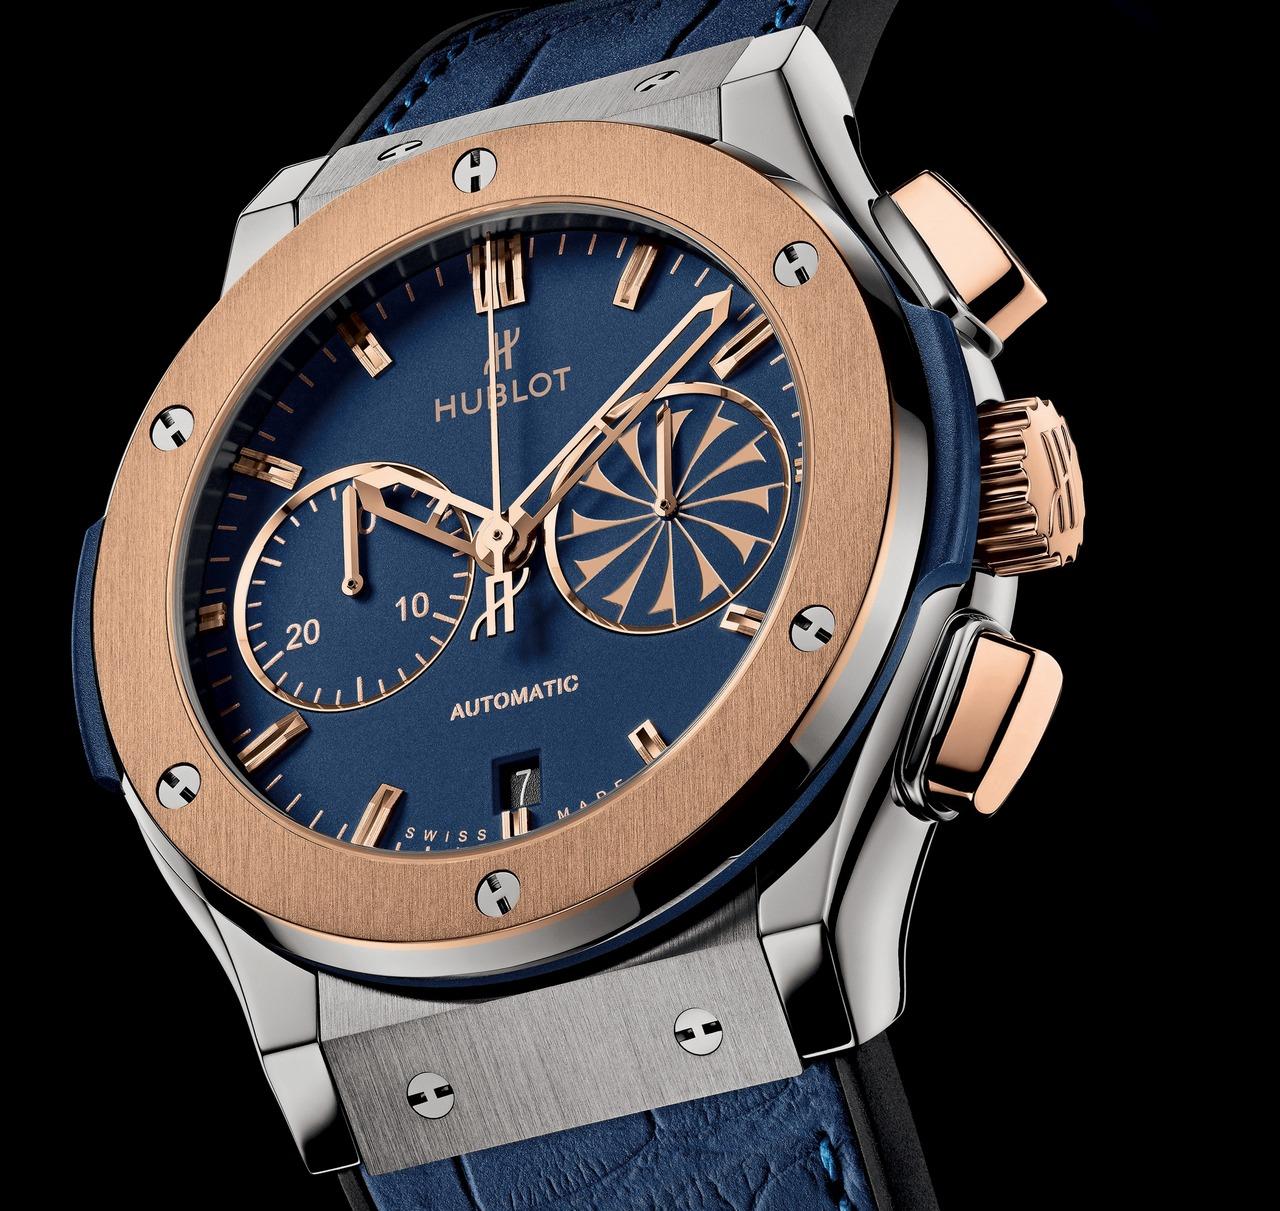 hublot-cronografo-classic-fusion-mykonos-2013_0-100_2